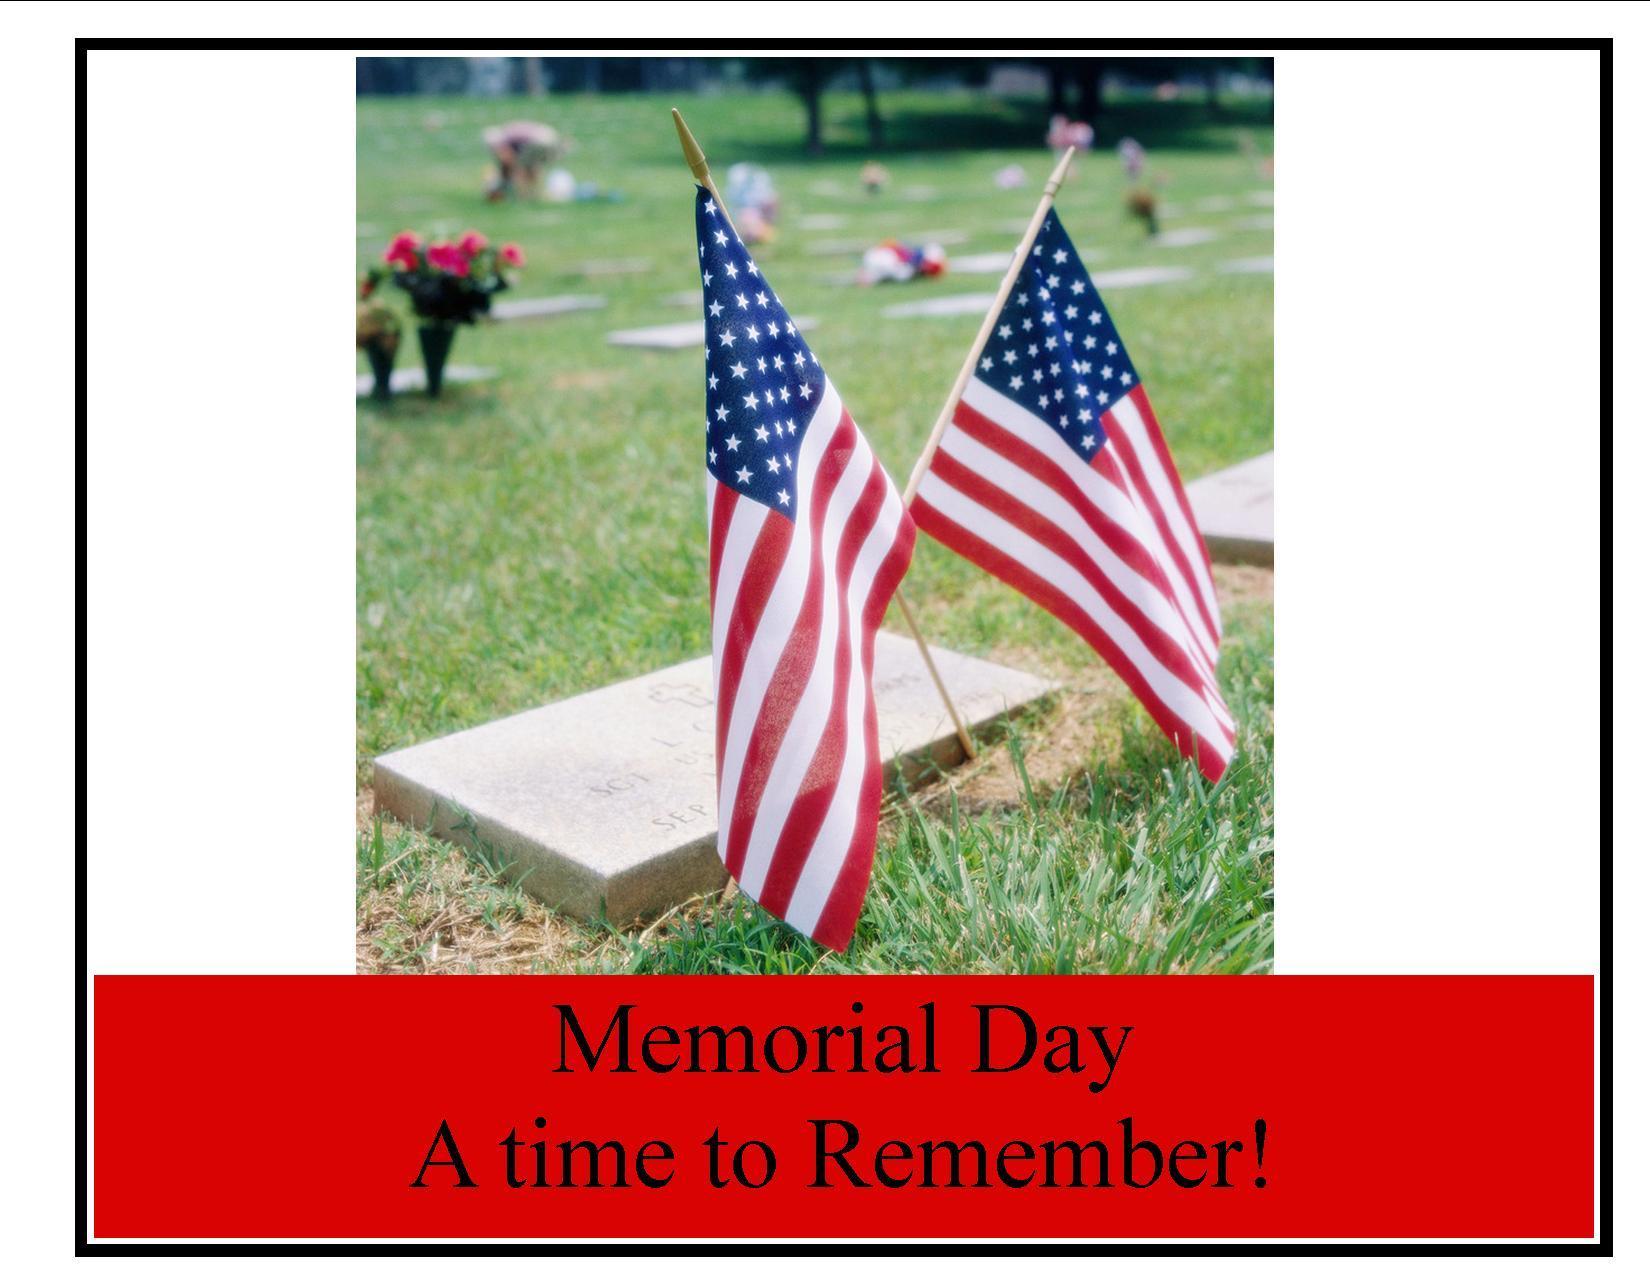 de2314132242dc5271ba_Memorial_Day_original_graphic.jpg